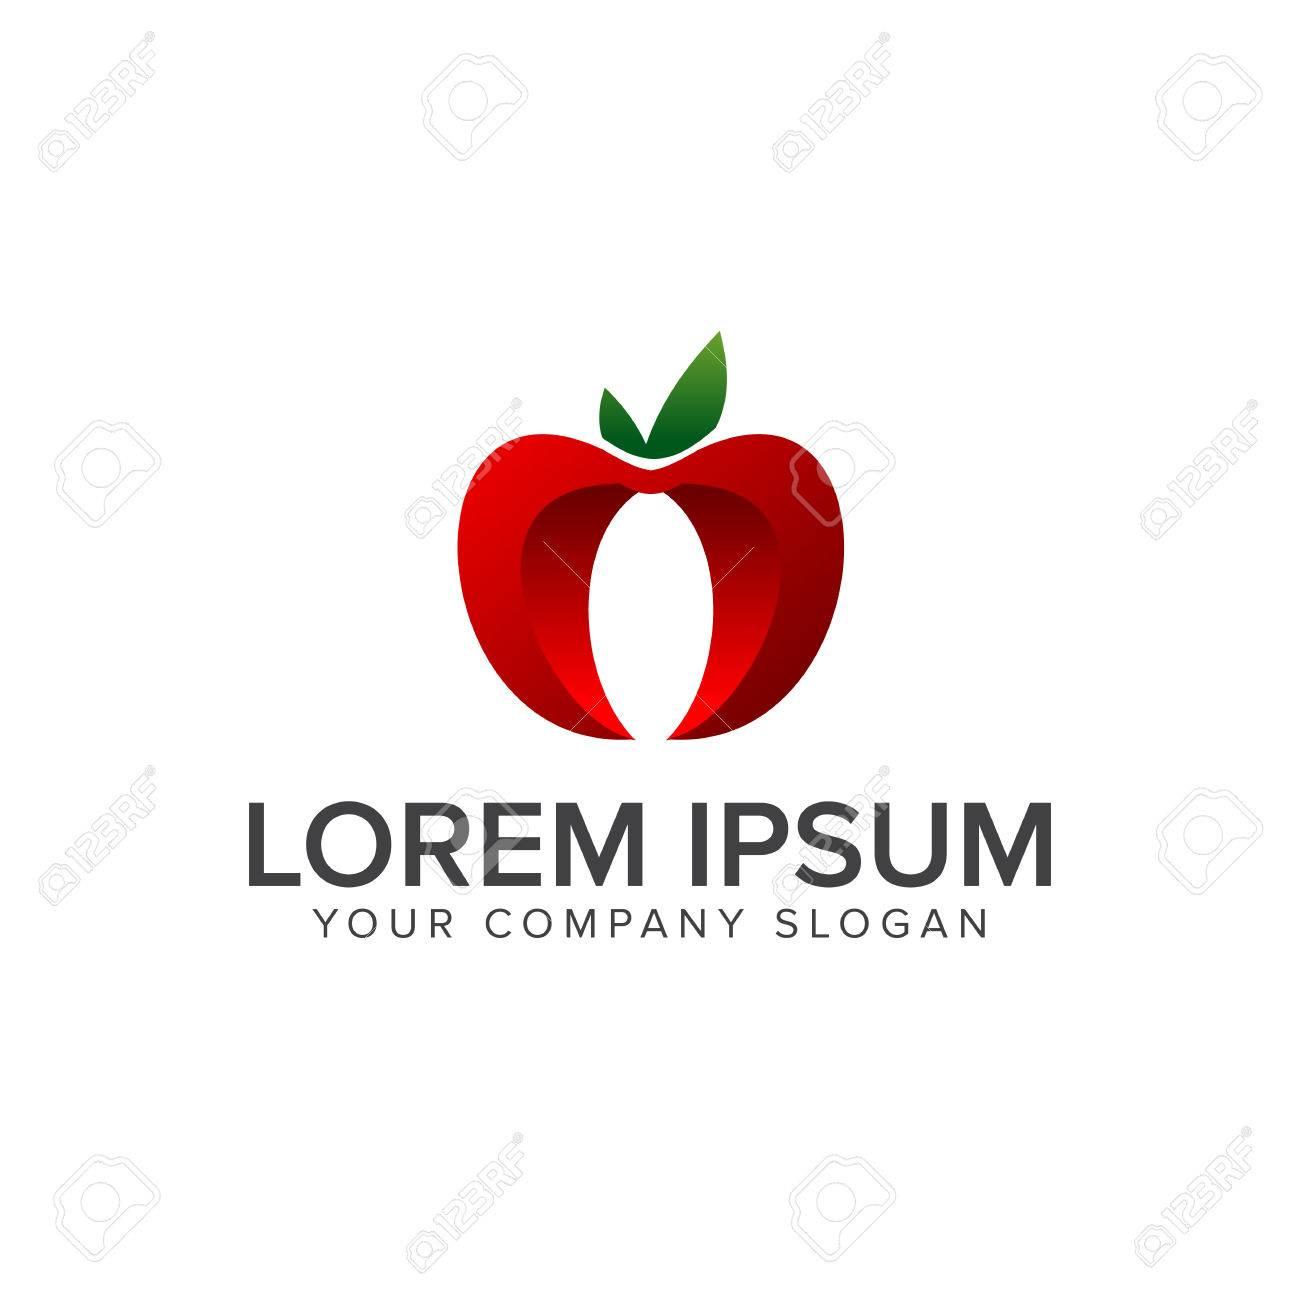 apple fruit logo 3d design concept template royalty free cliparts